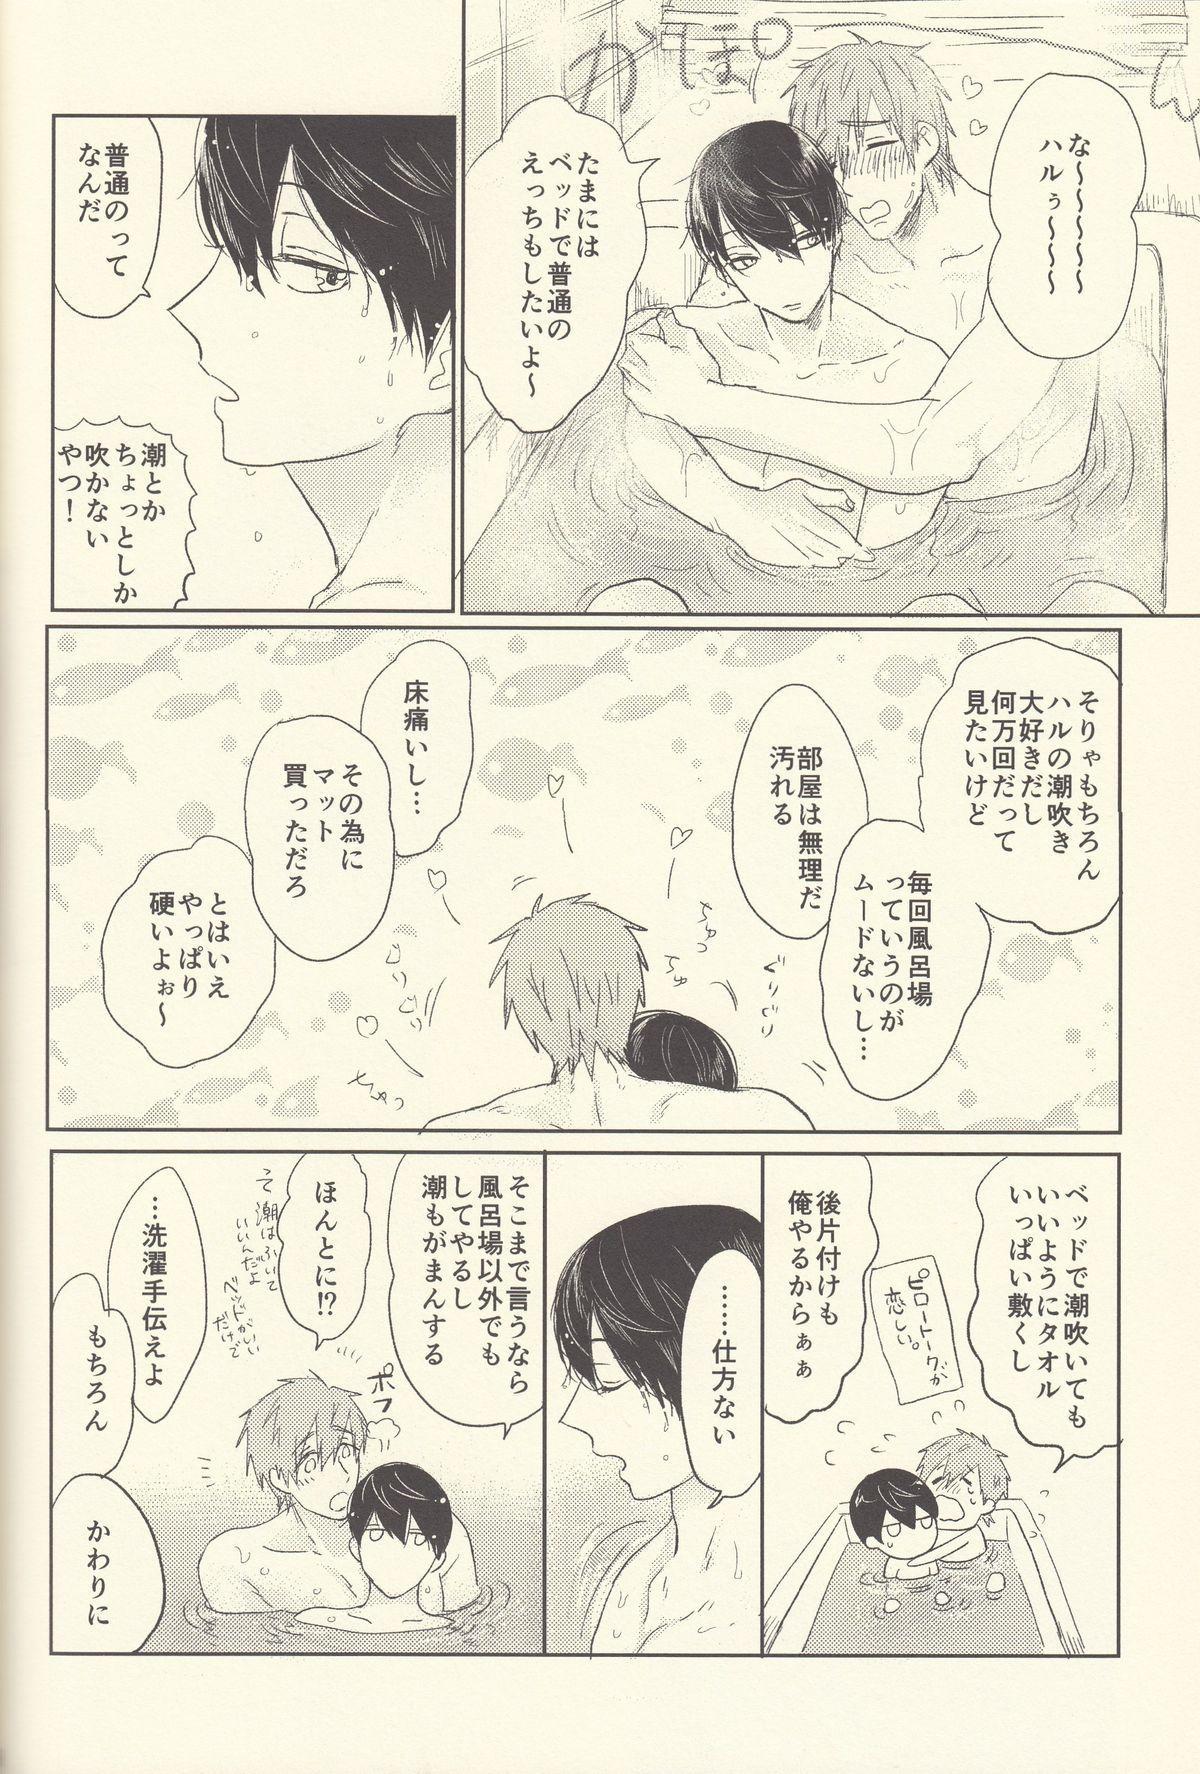 Shiofuki no Friendship - Makoto ♥ Haruka Squirting Anthology 64